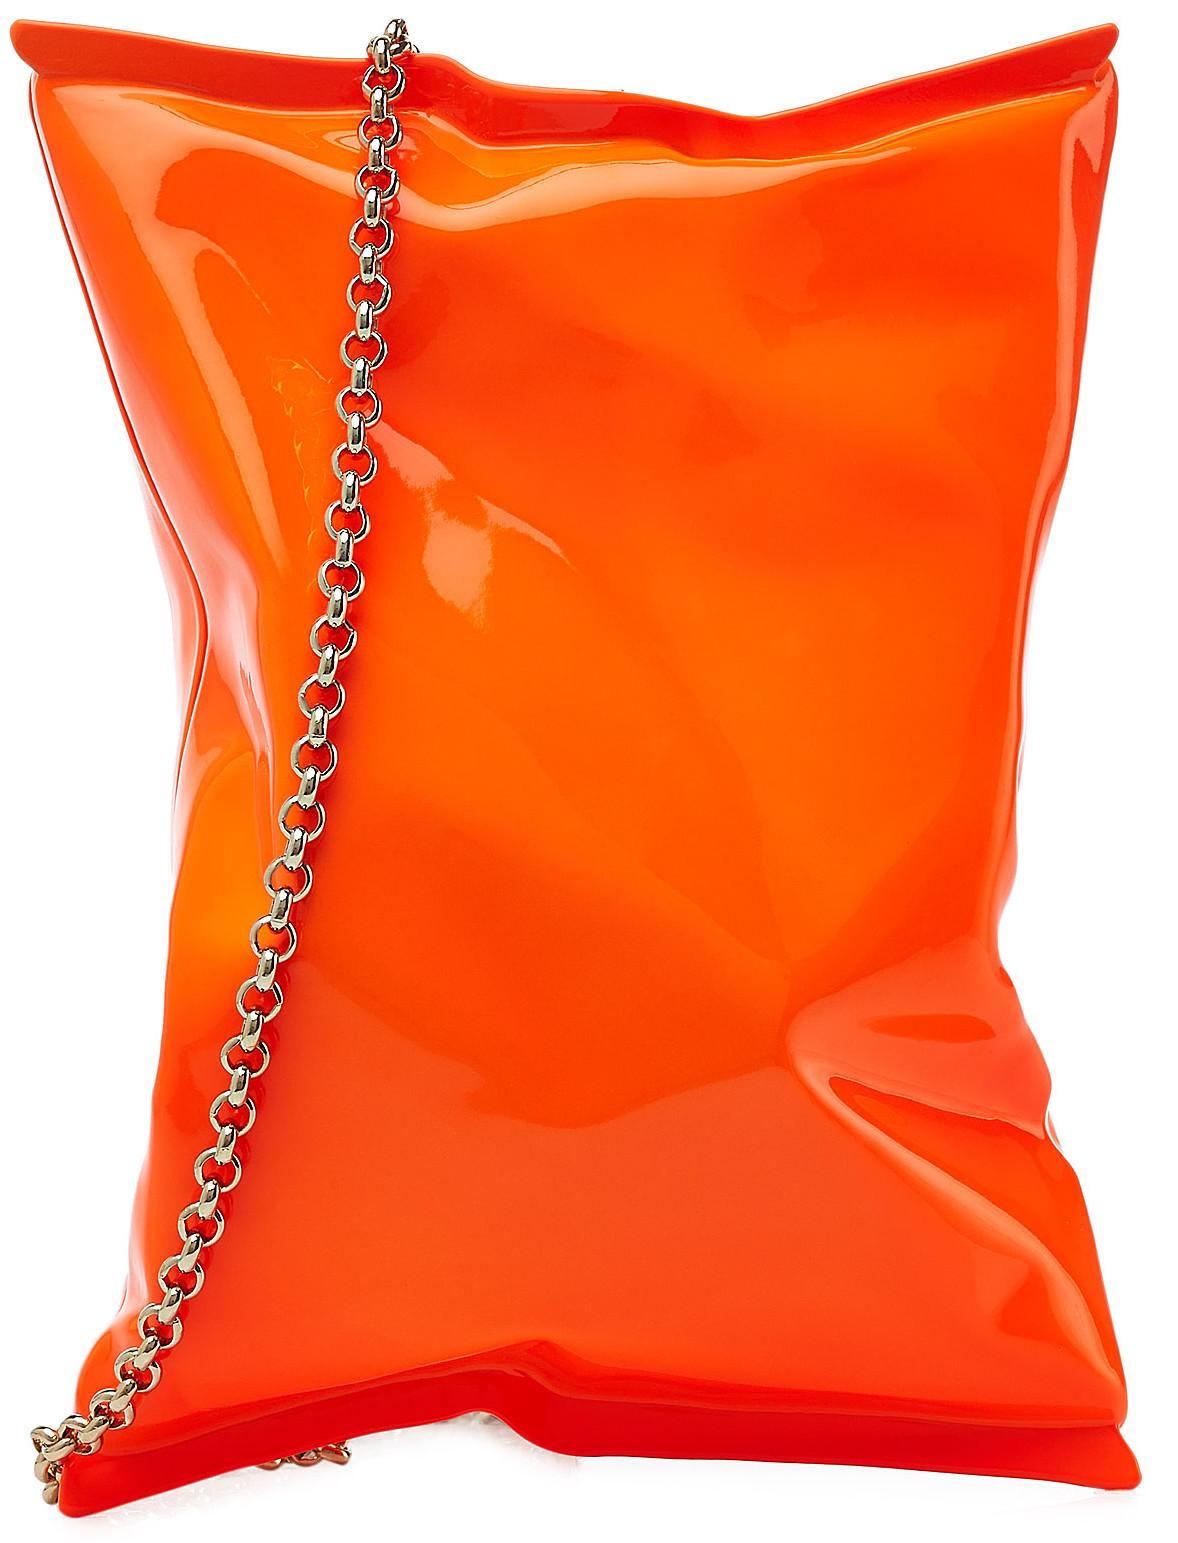 Anya Hindmarch crisp packet clutch neon orange